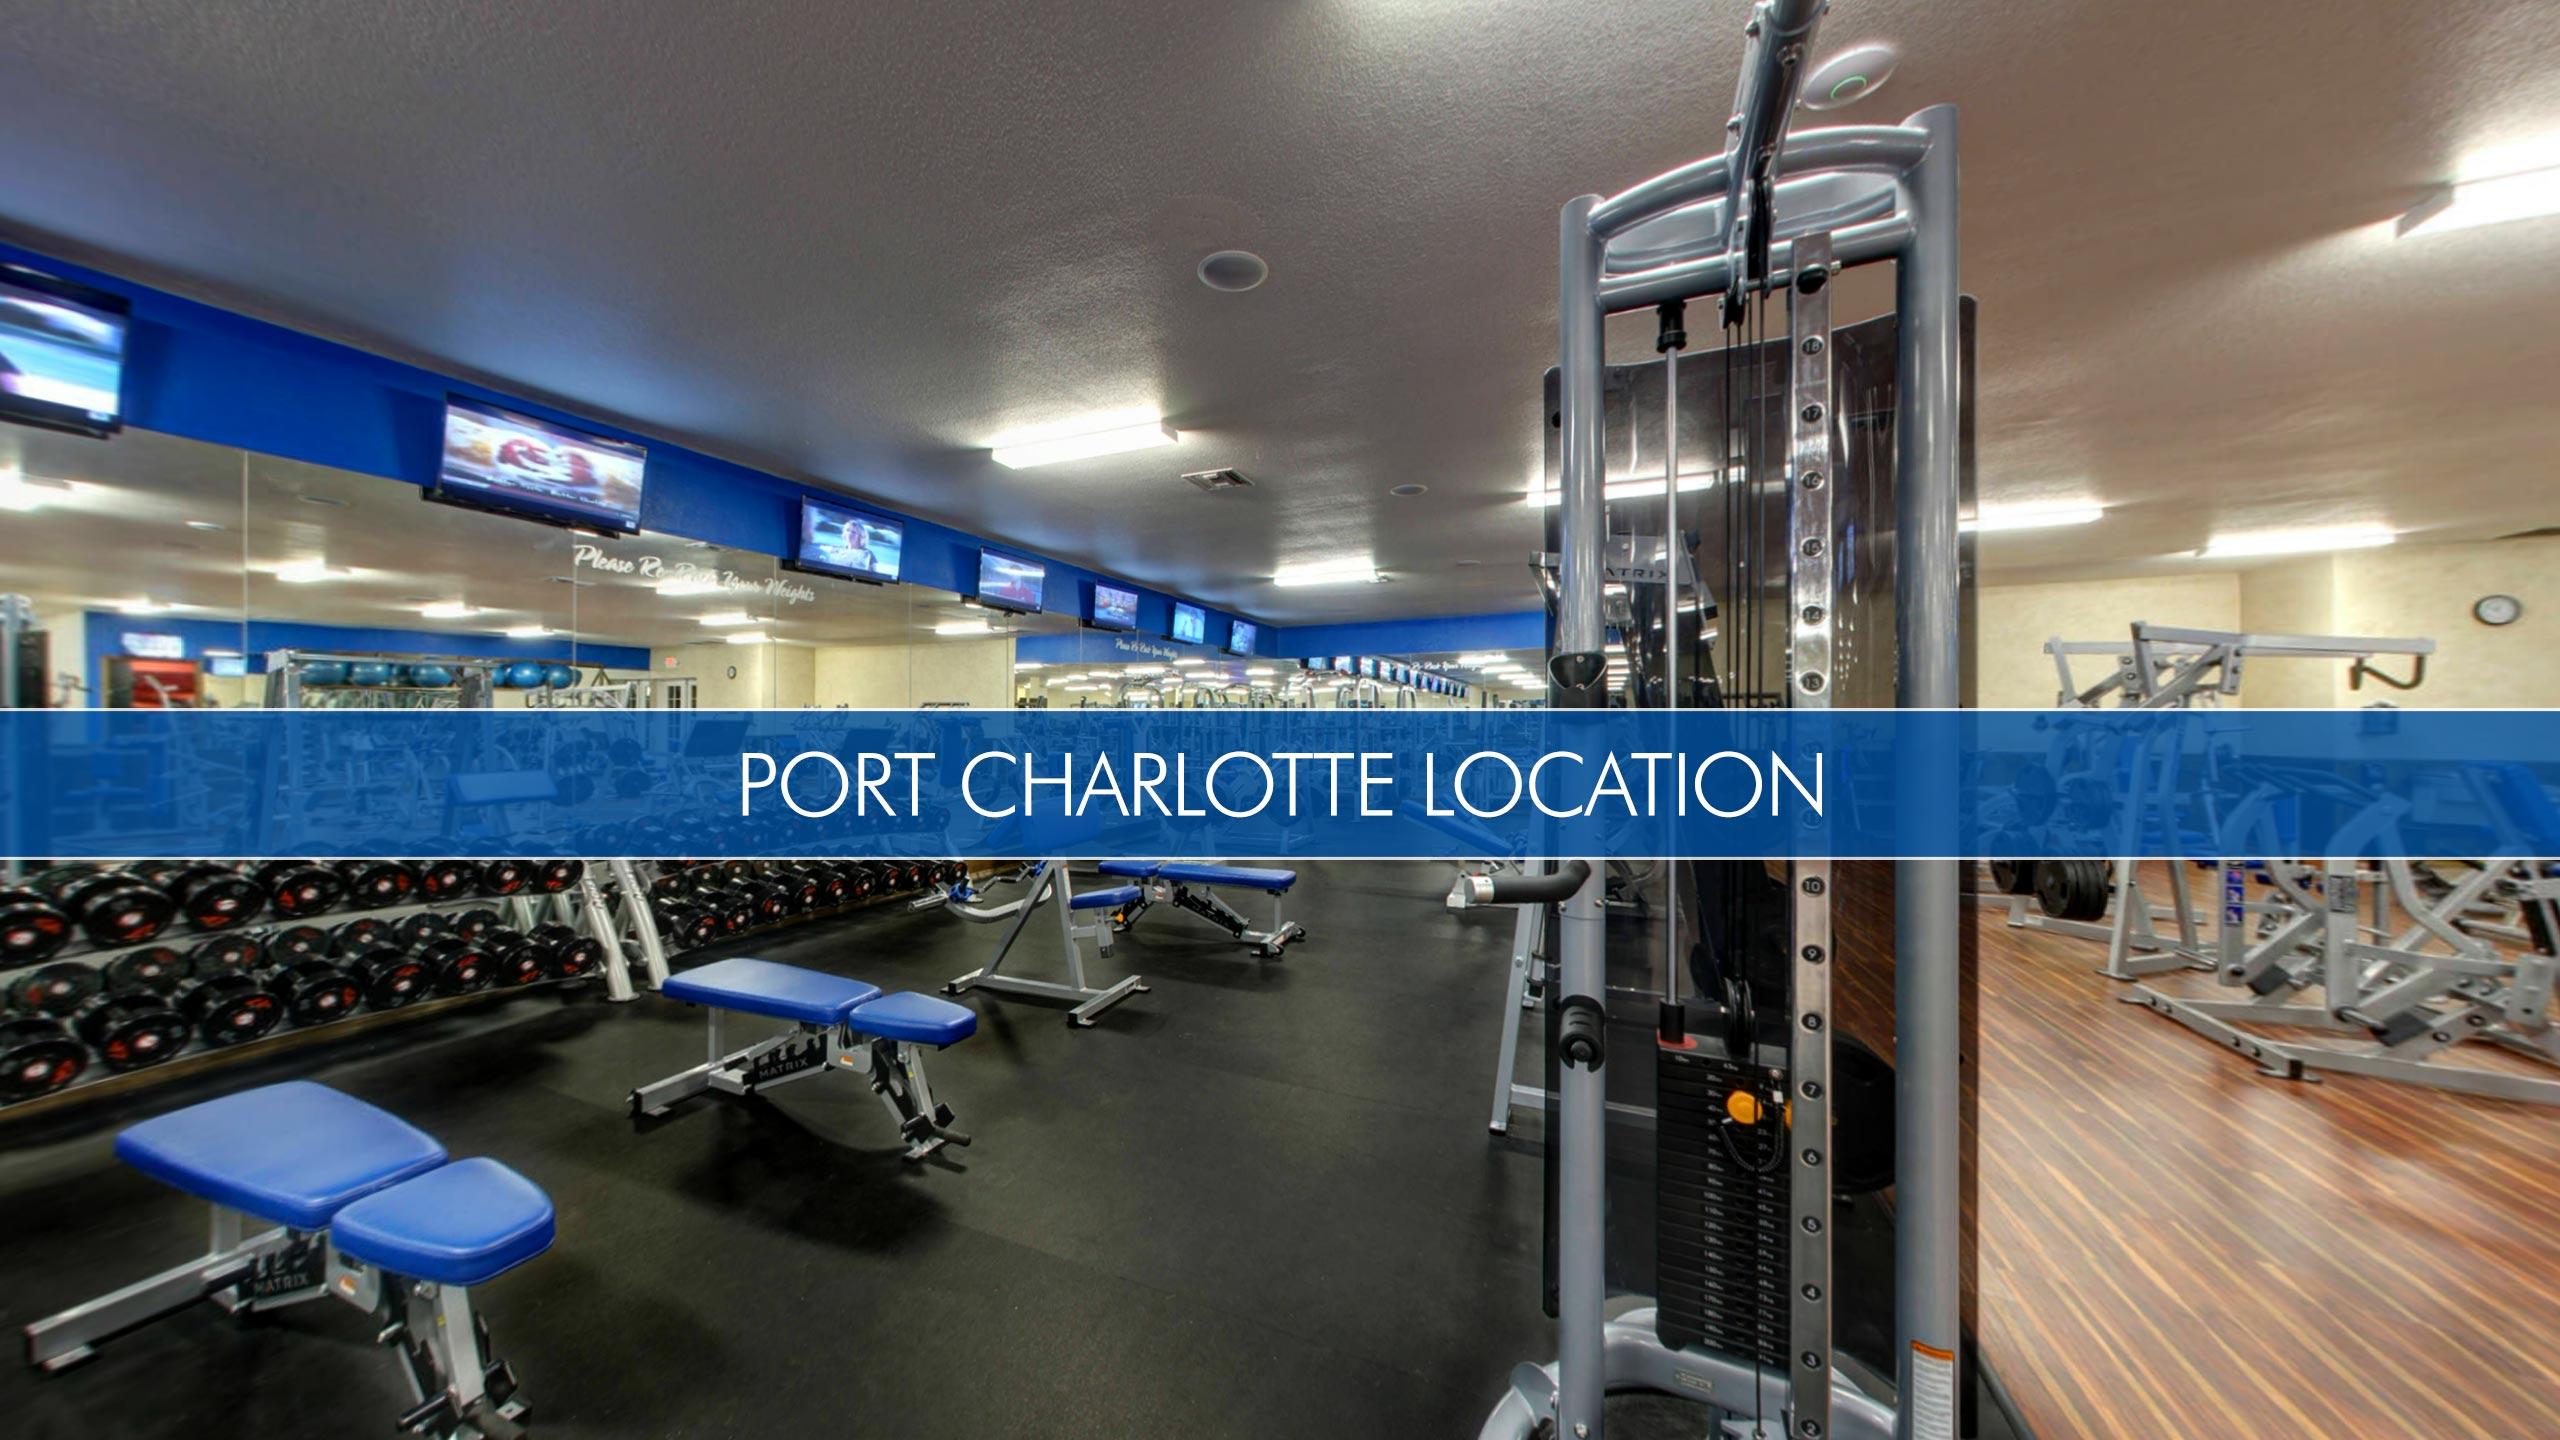 Port Charlotte Location